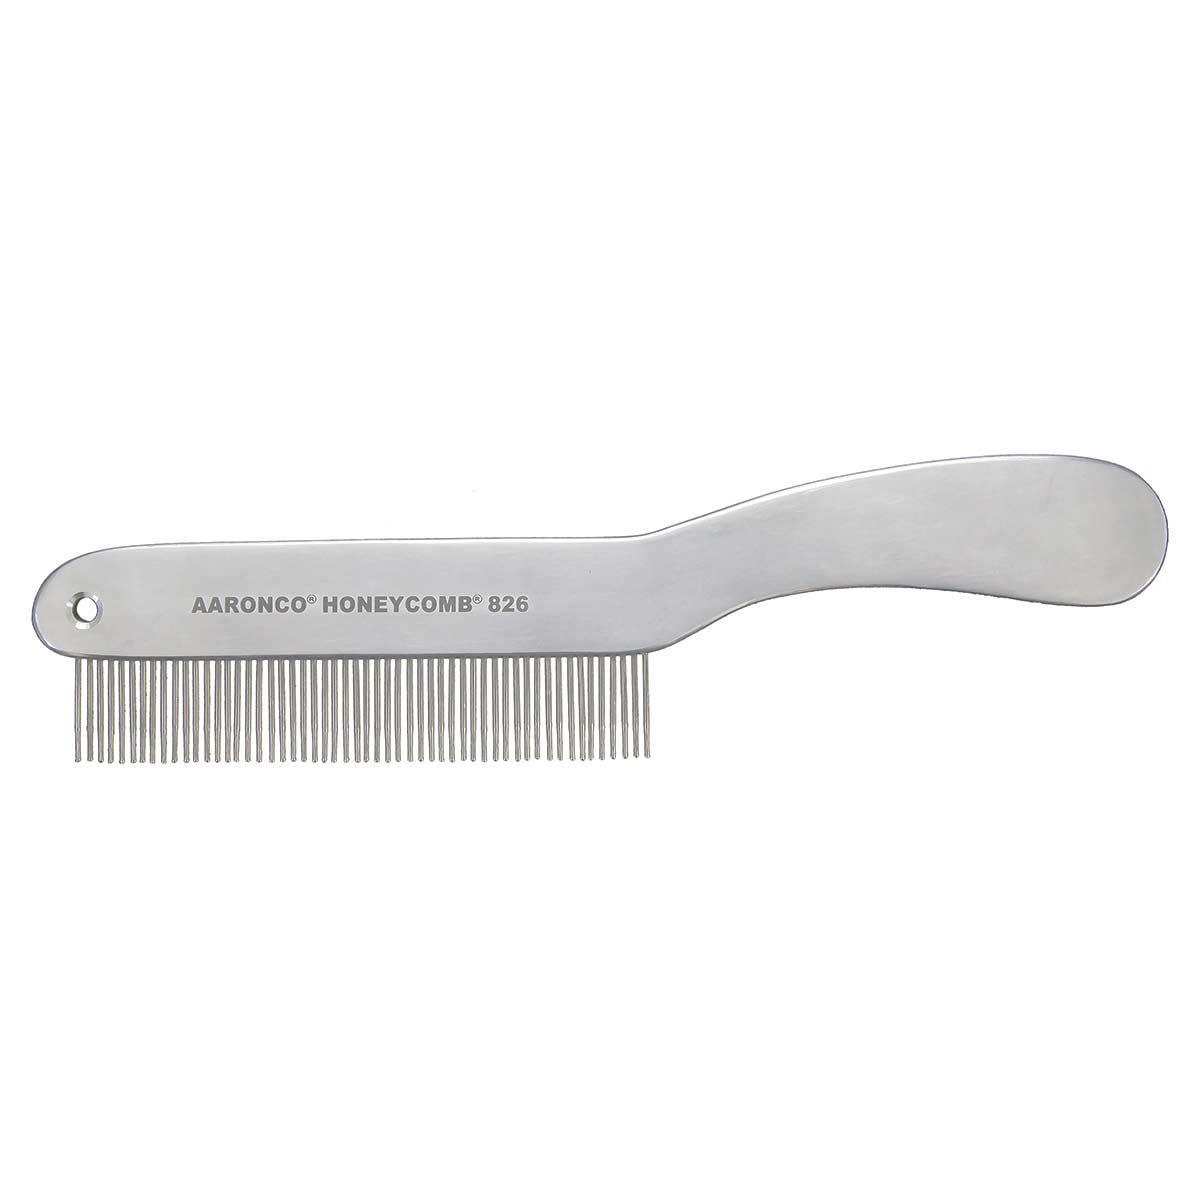 "Grooming Comb AARONCO HONEYCOMBS 8.5"" Short Hair 51 Medium Teeth ¾"" Long"